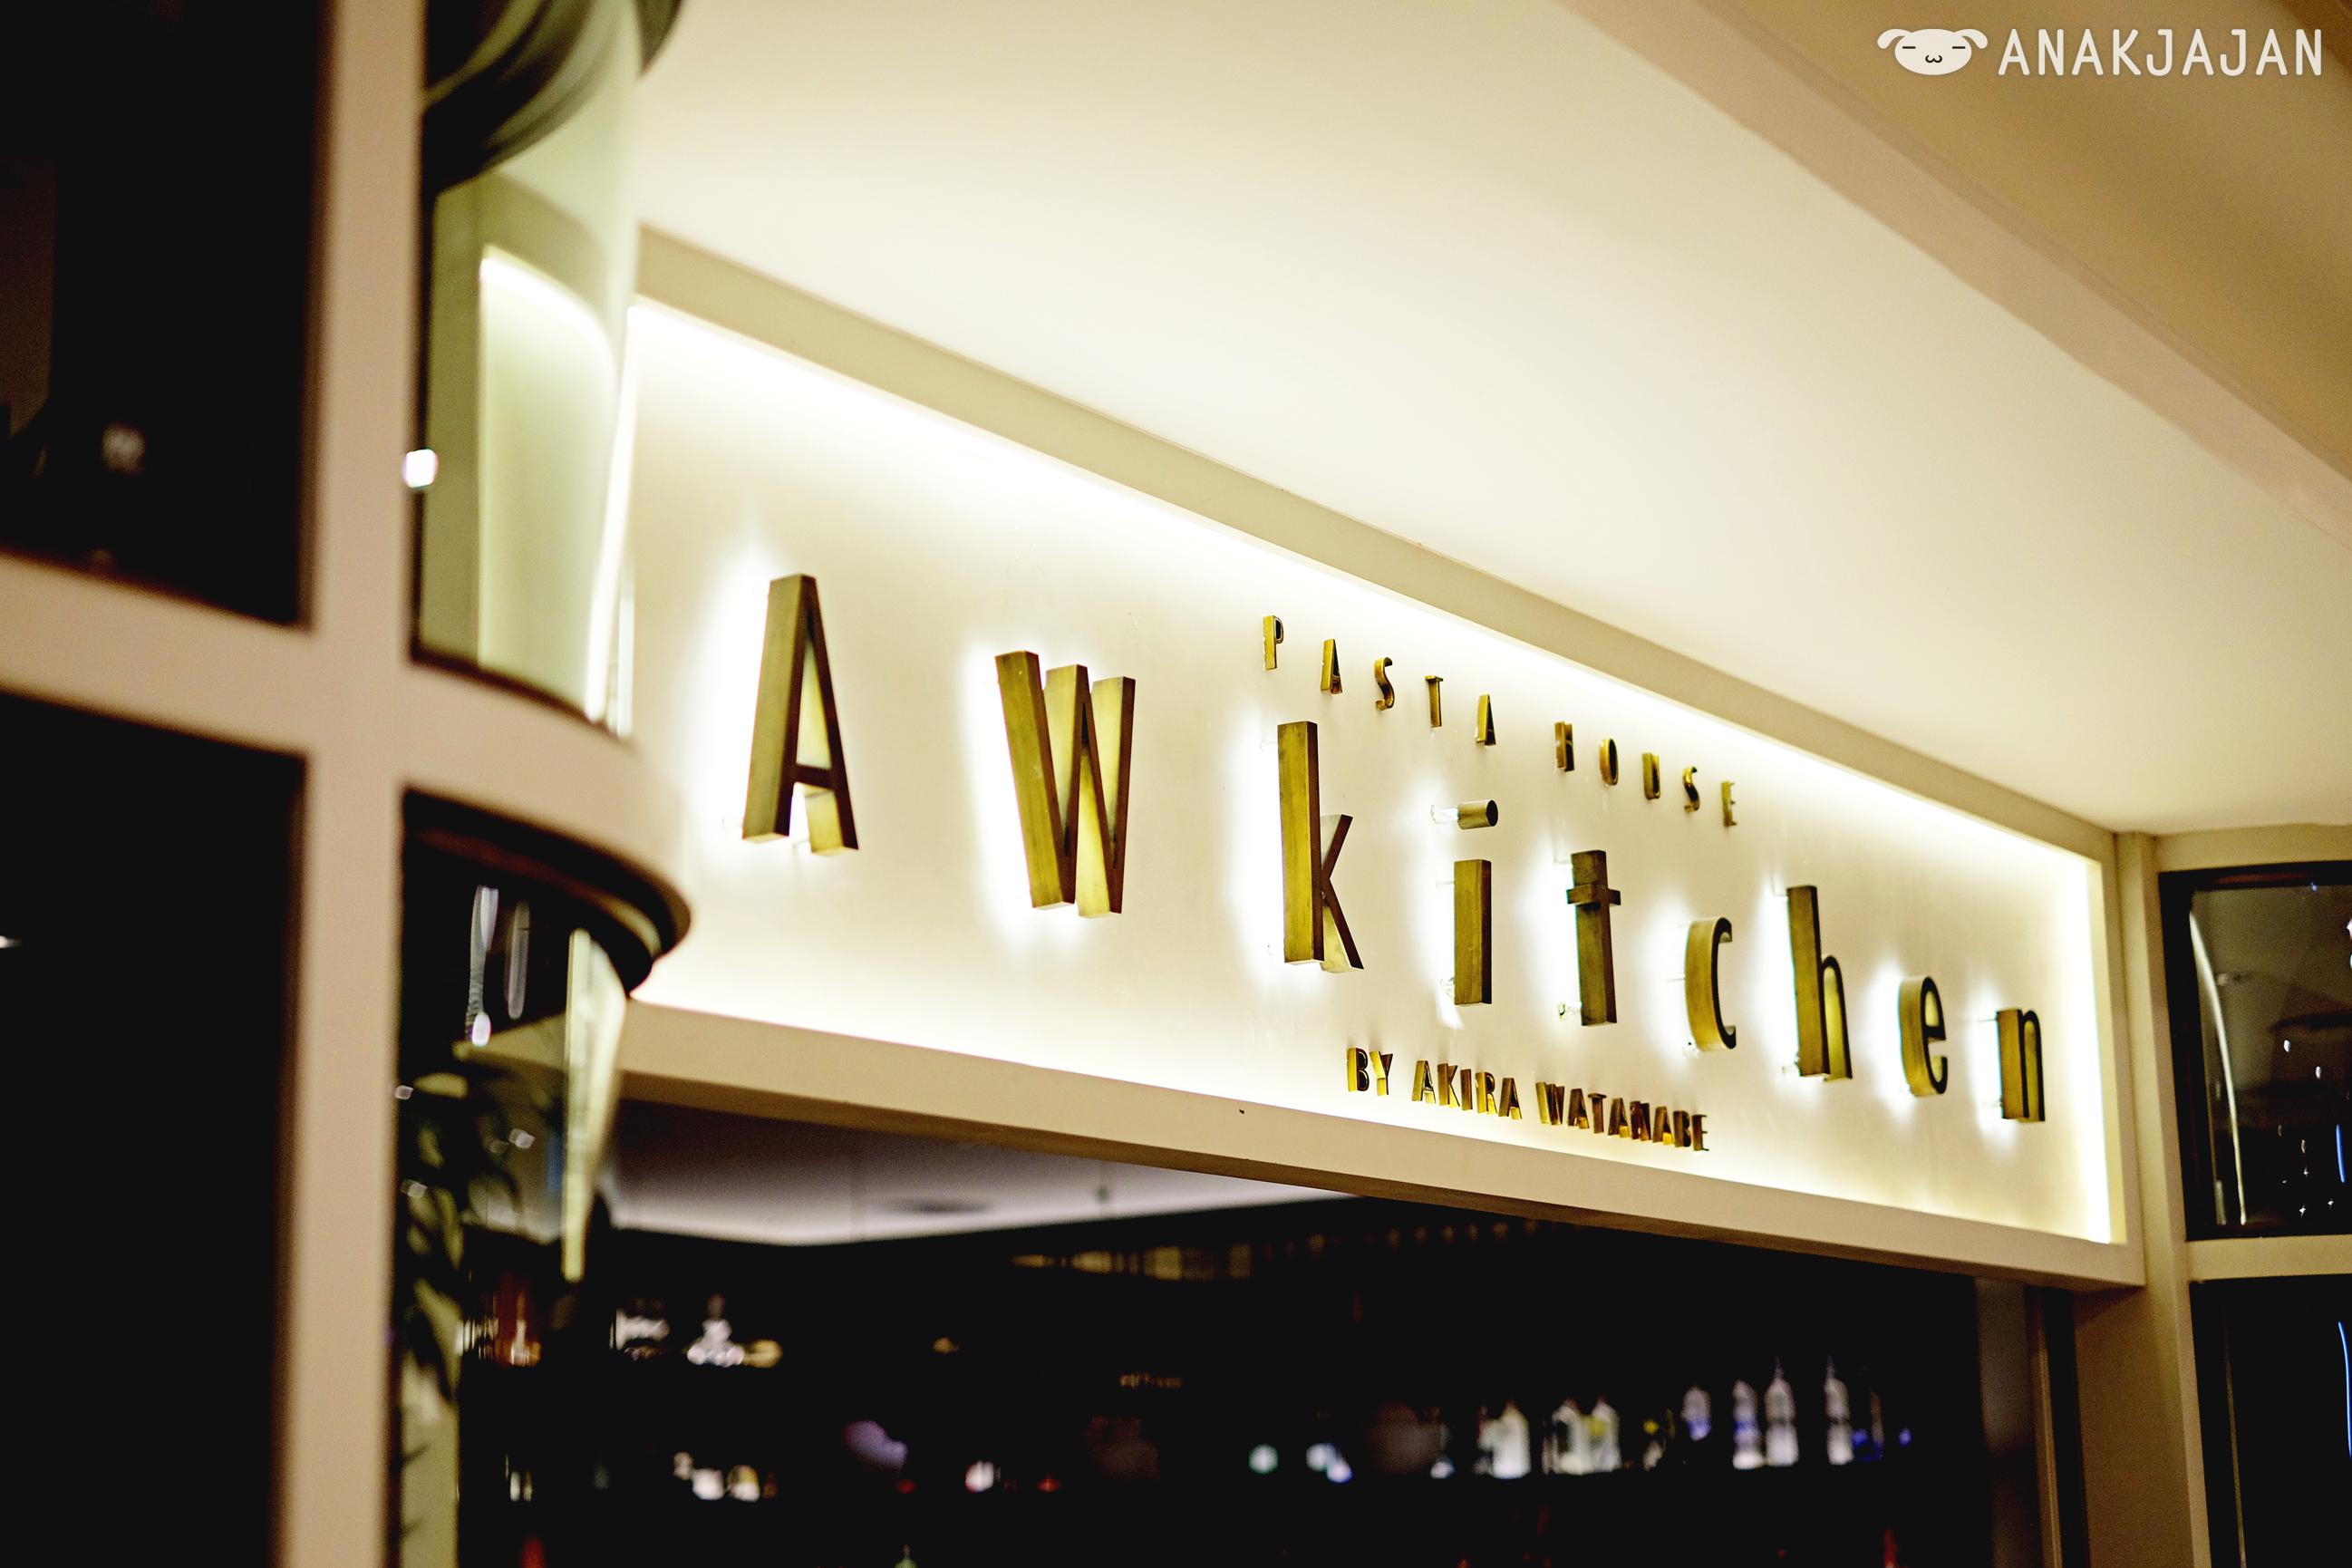 AW Kitchen by Akira Watanabe | ANAKJAJAN.COM